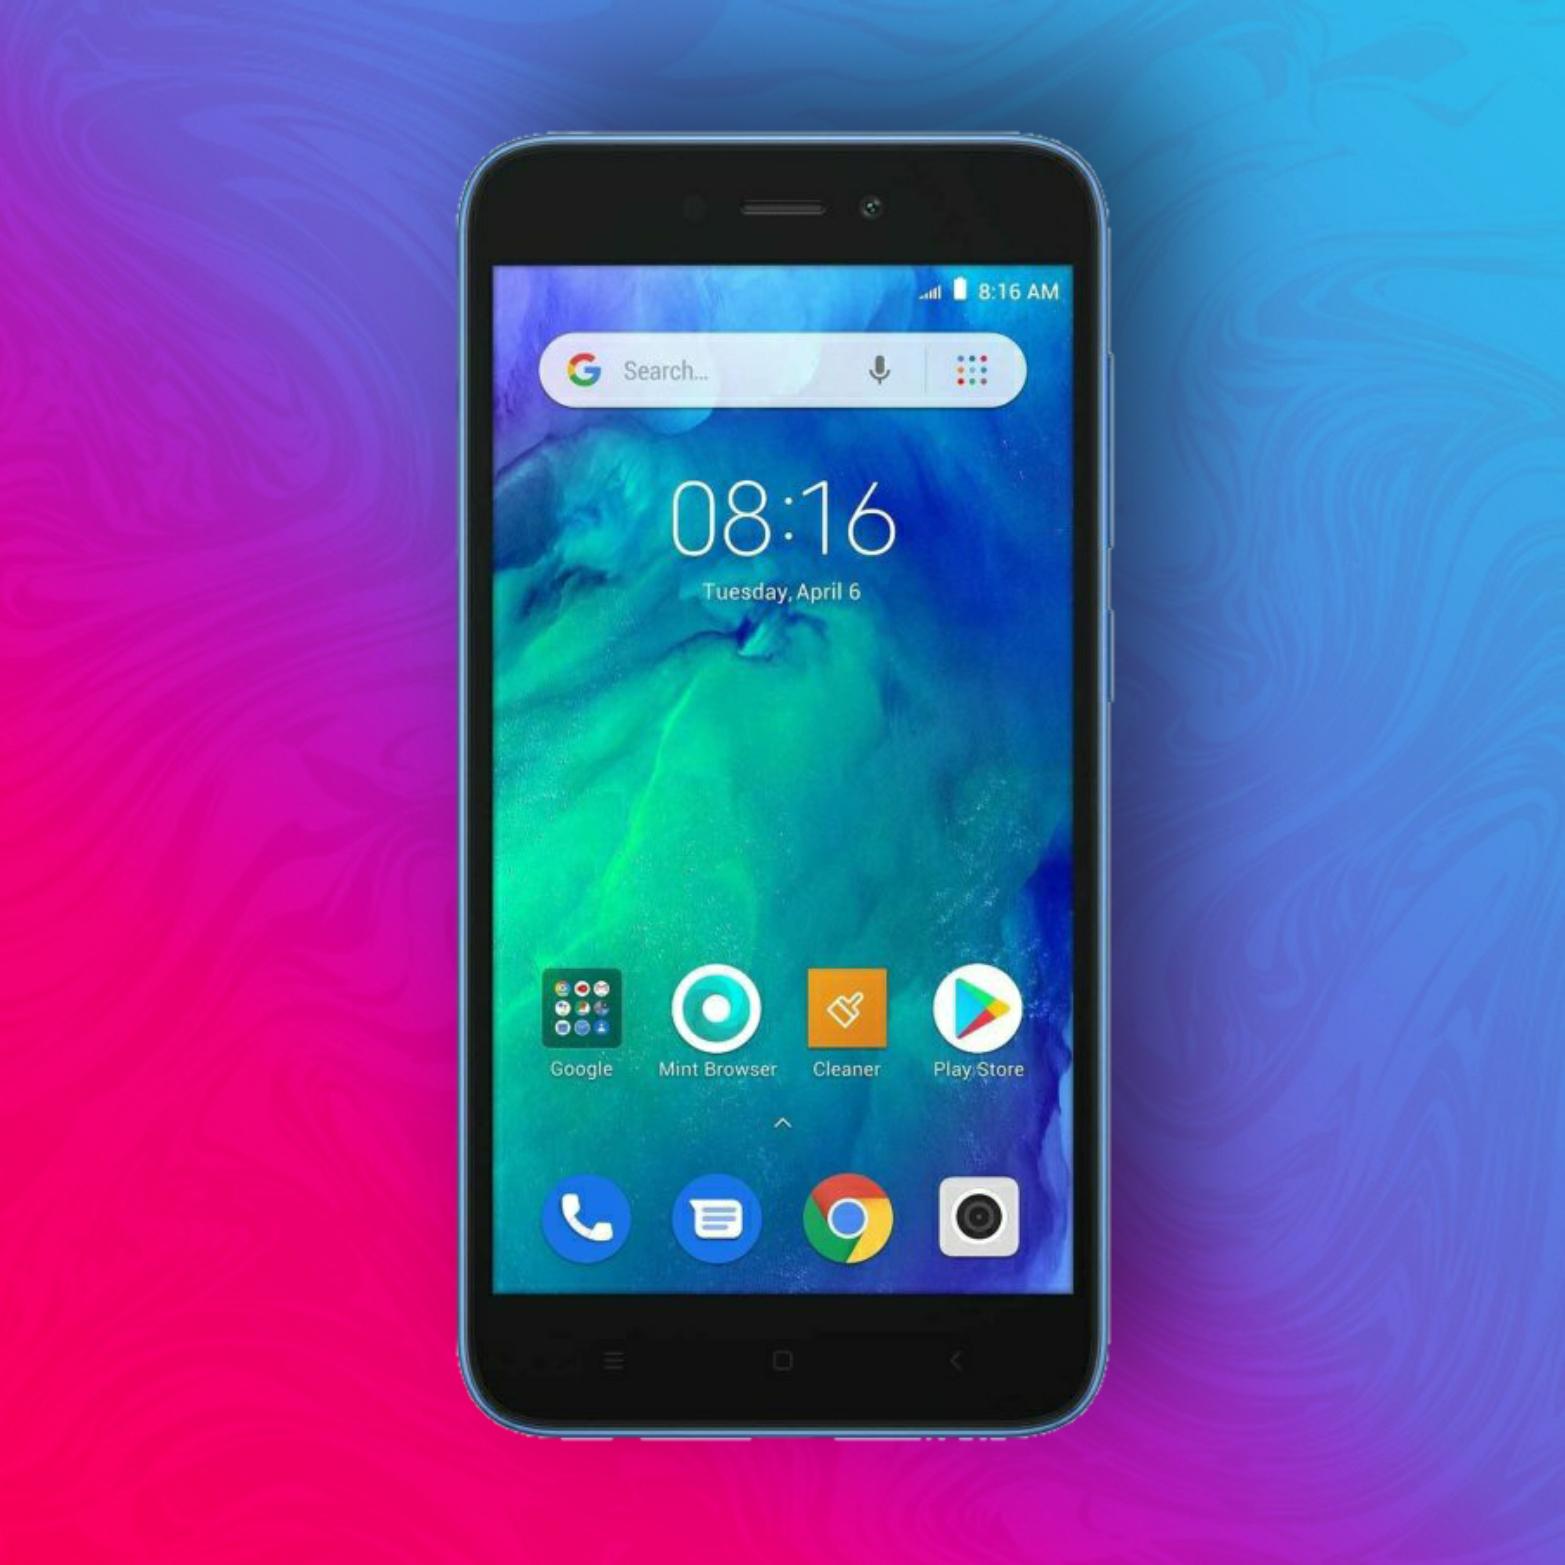 "Xiaomi Redmi Go 8/1GB - Snapdragon 425 - 5"" HD Display - 8+5MP - Klinkenanschluss - Dual SIM + MicroSD - Google Go   Global mit Band 20"